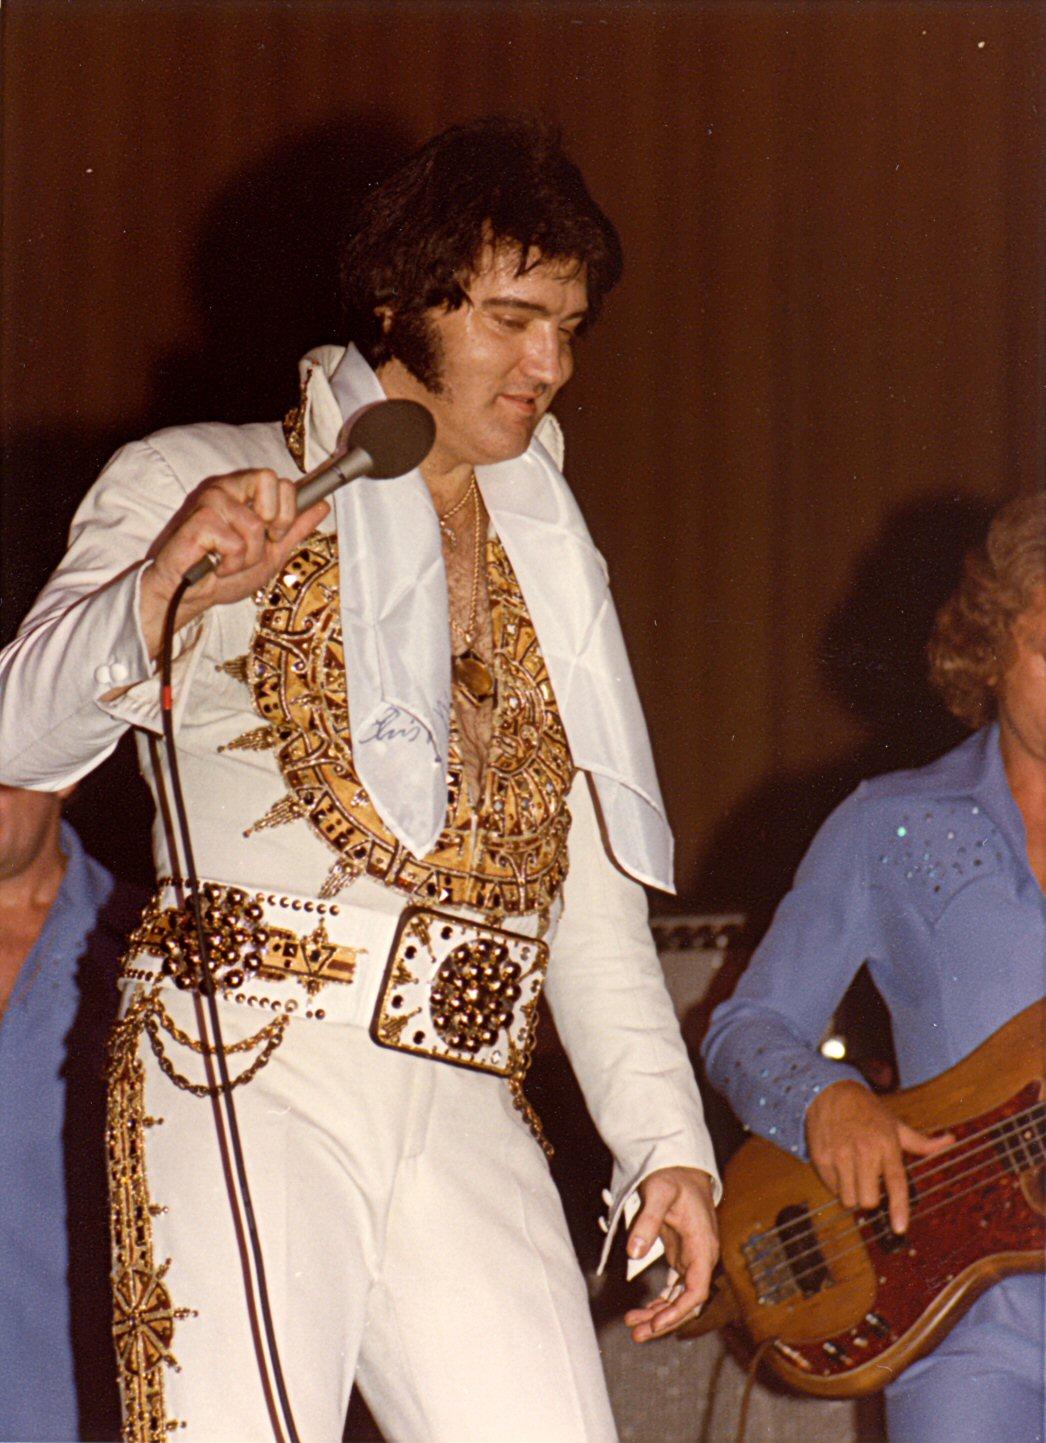 Sioux Falls Wallpaper Elvis Presley In Concert